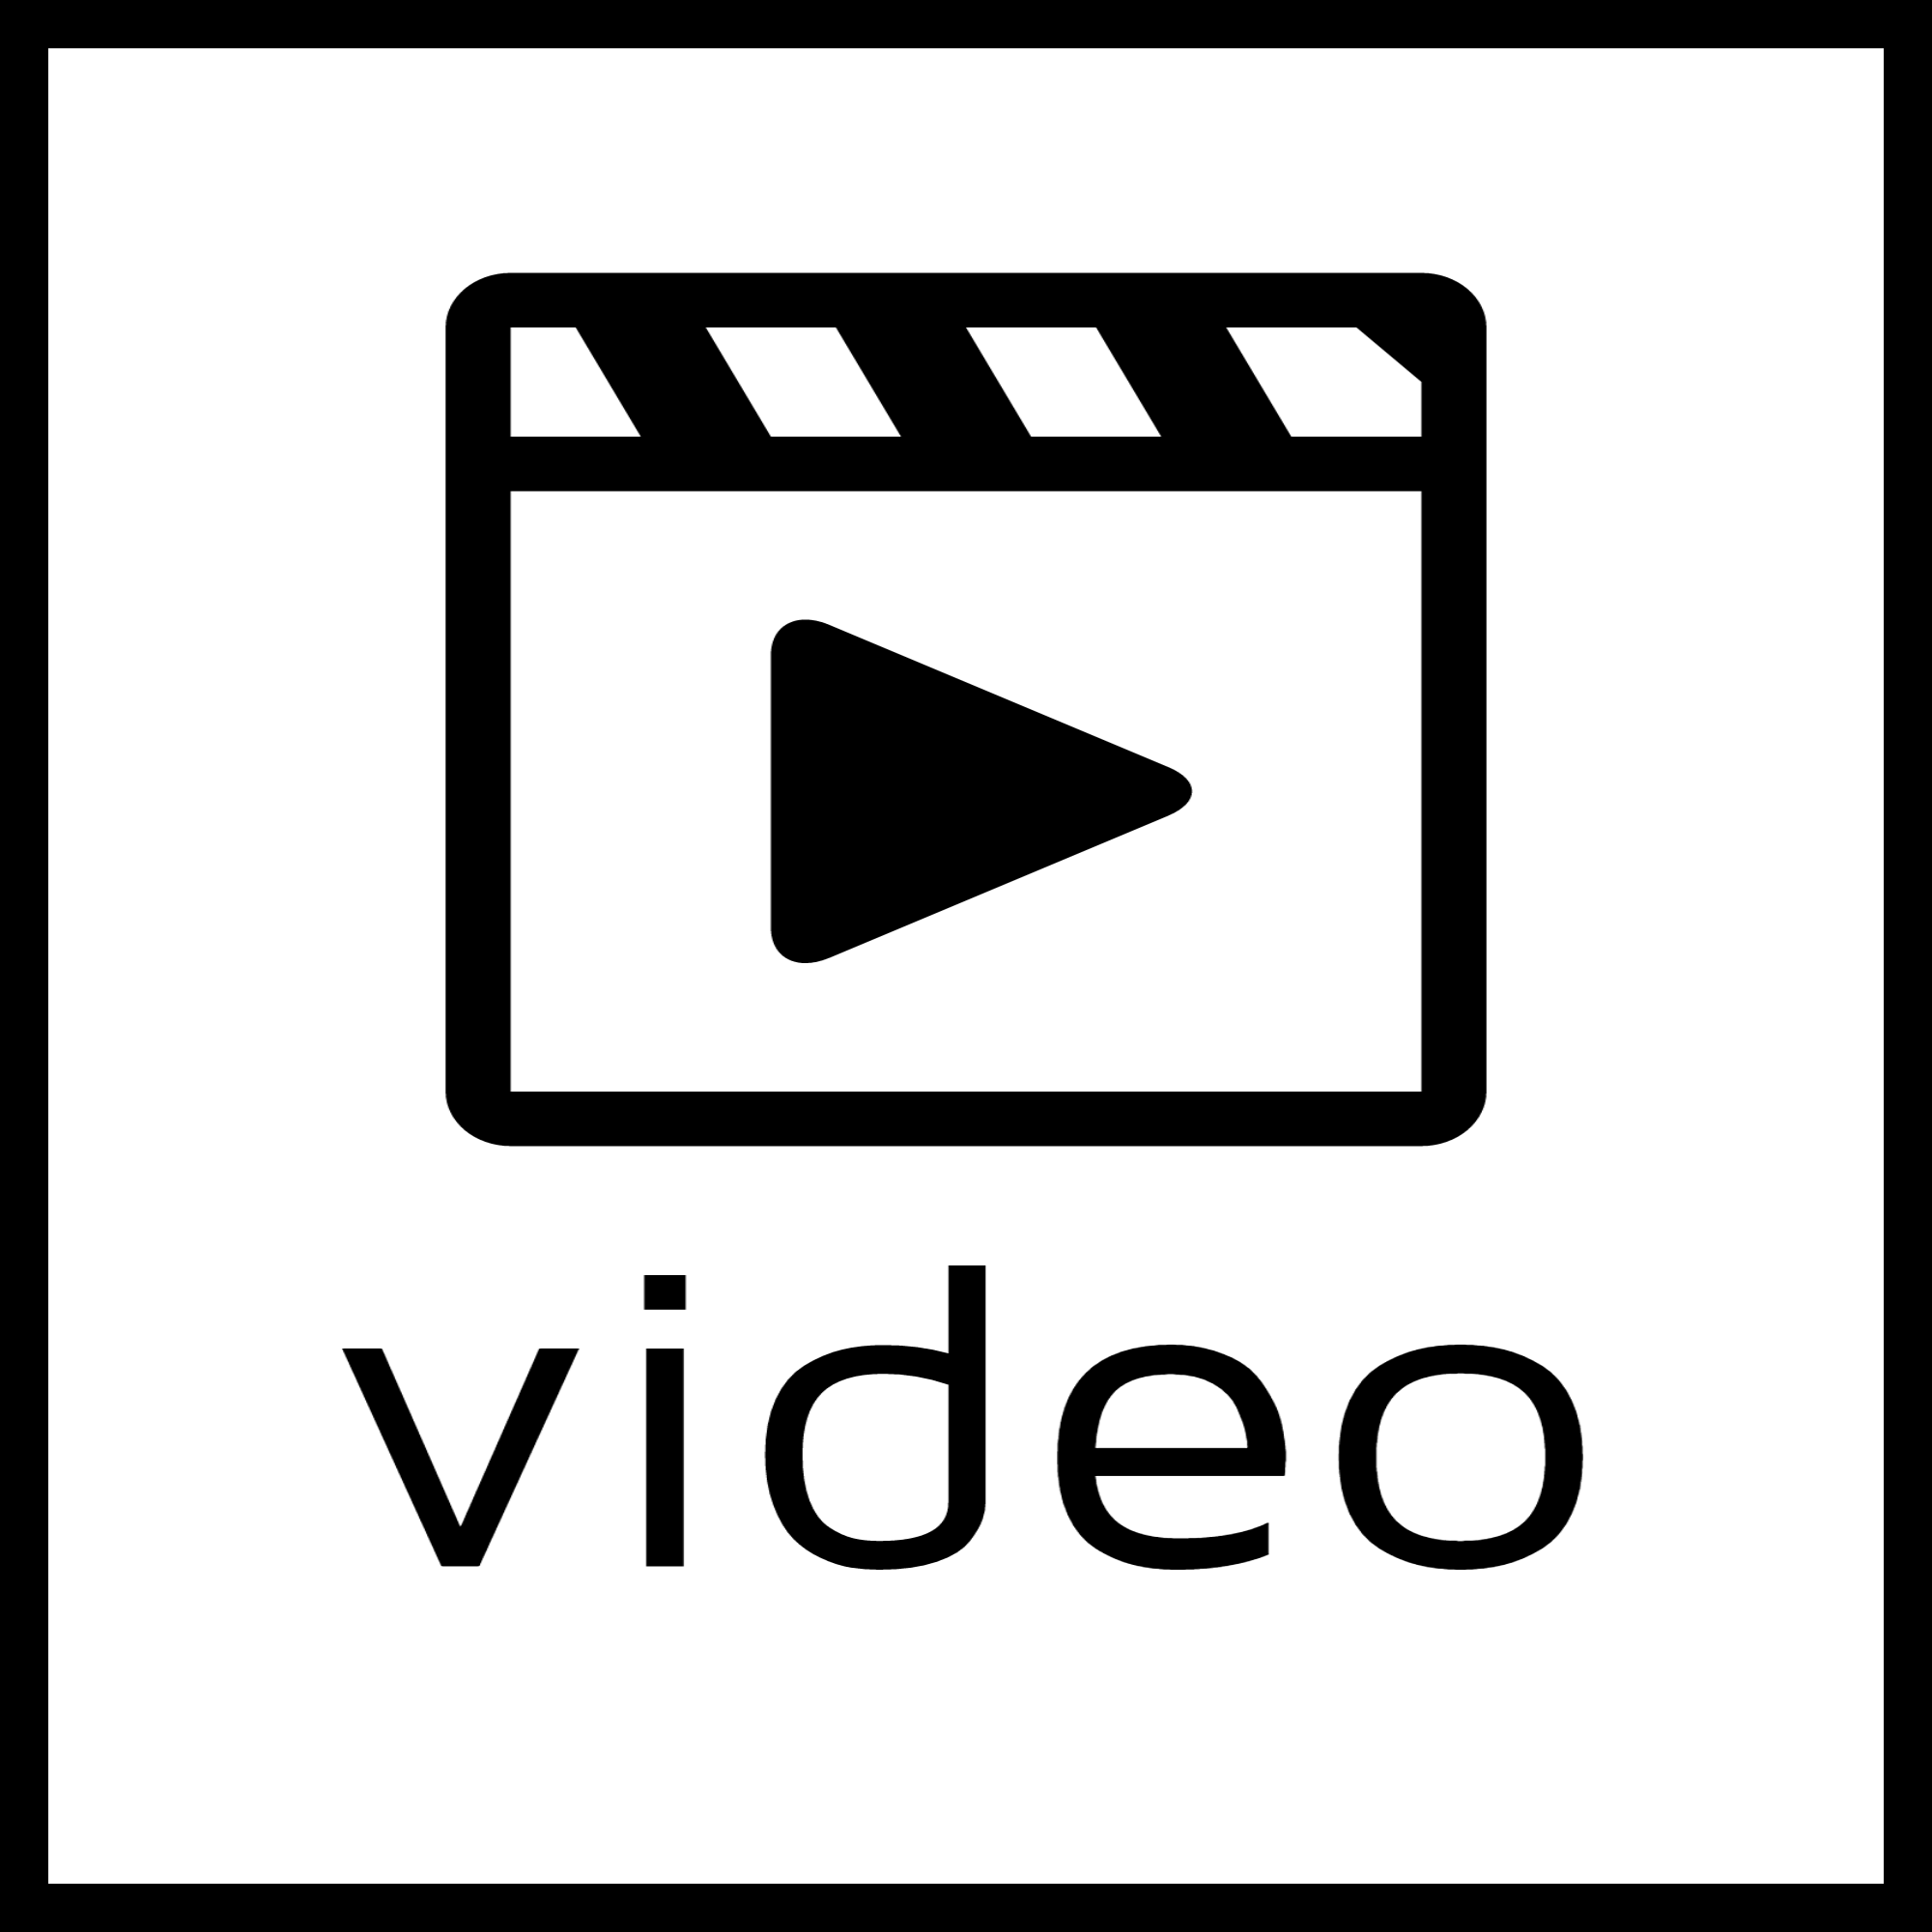 video-logo-black.png